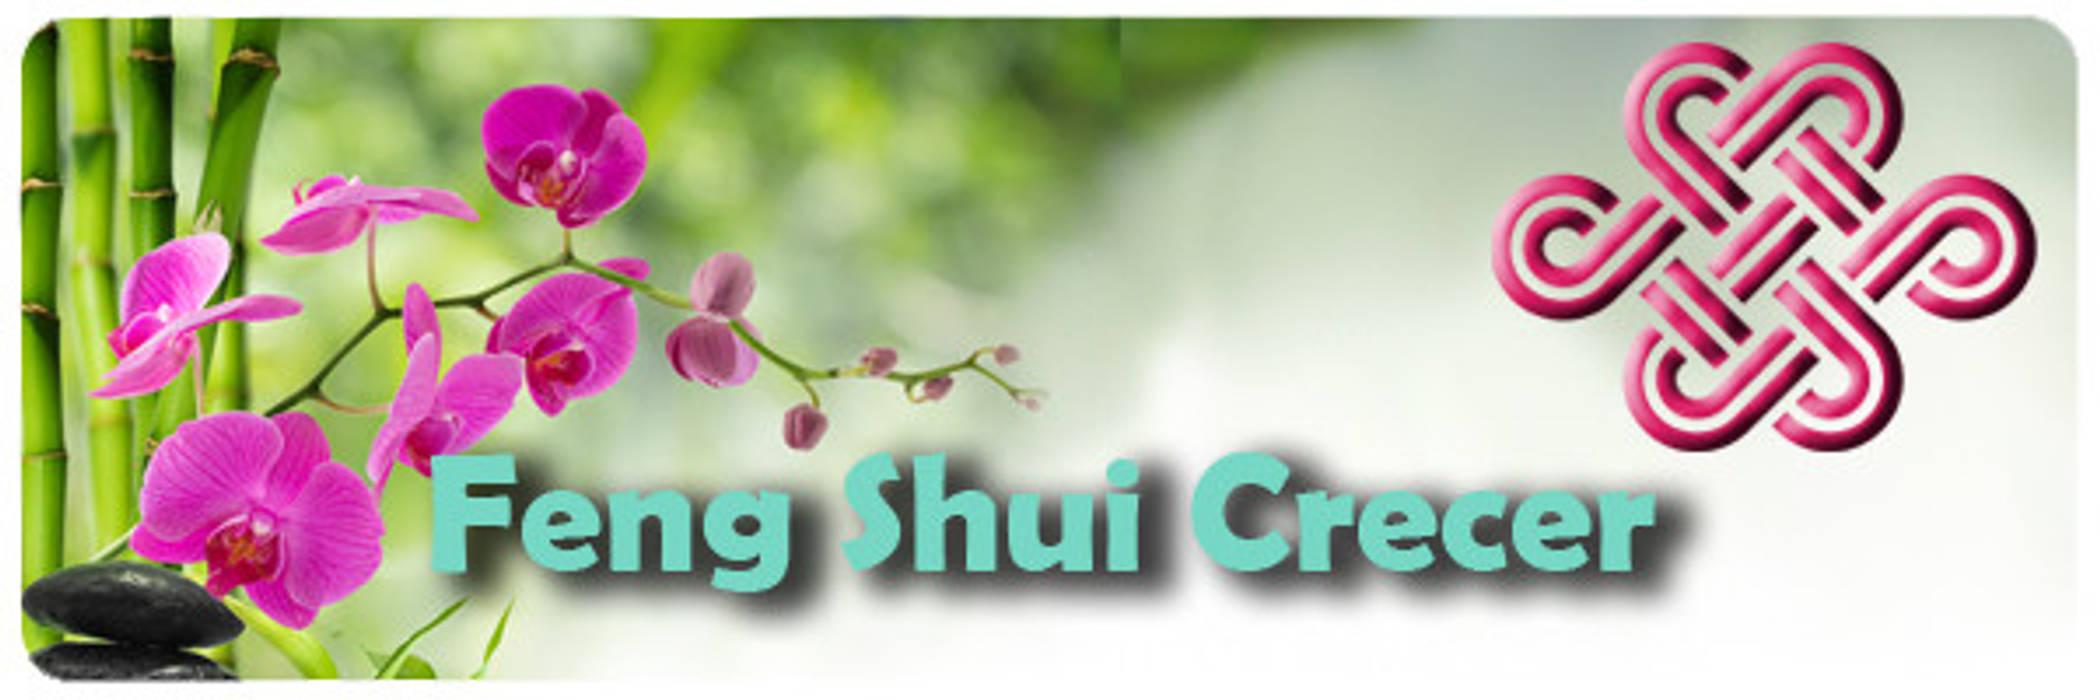 Feng Shui Crecer хатнє господарство хатнє господарствохатнє господарство хатнє господарство хатнє господарство хатнє господарство хатнє господарство домогосподарстваАксесуари та прикраси